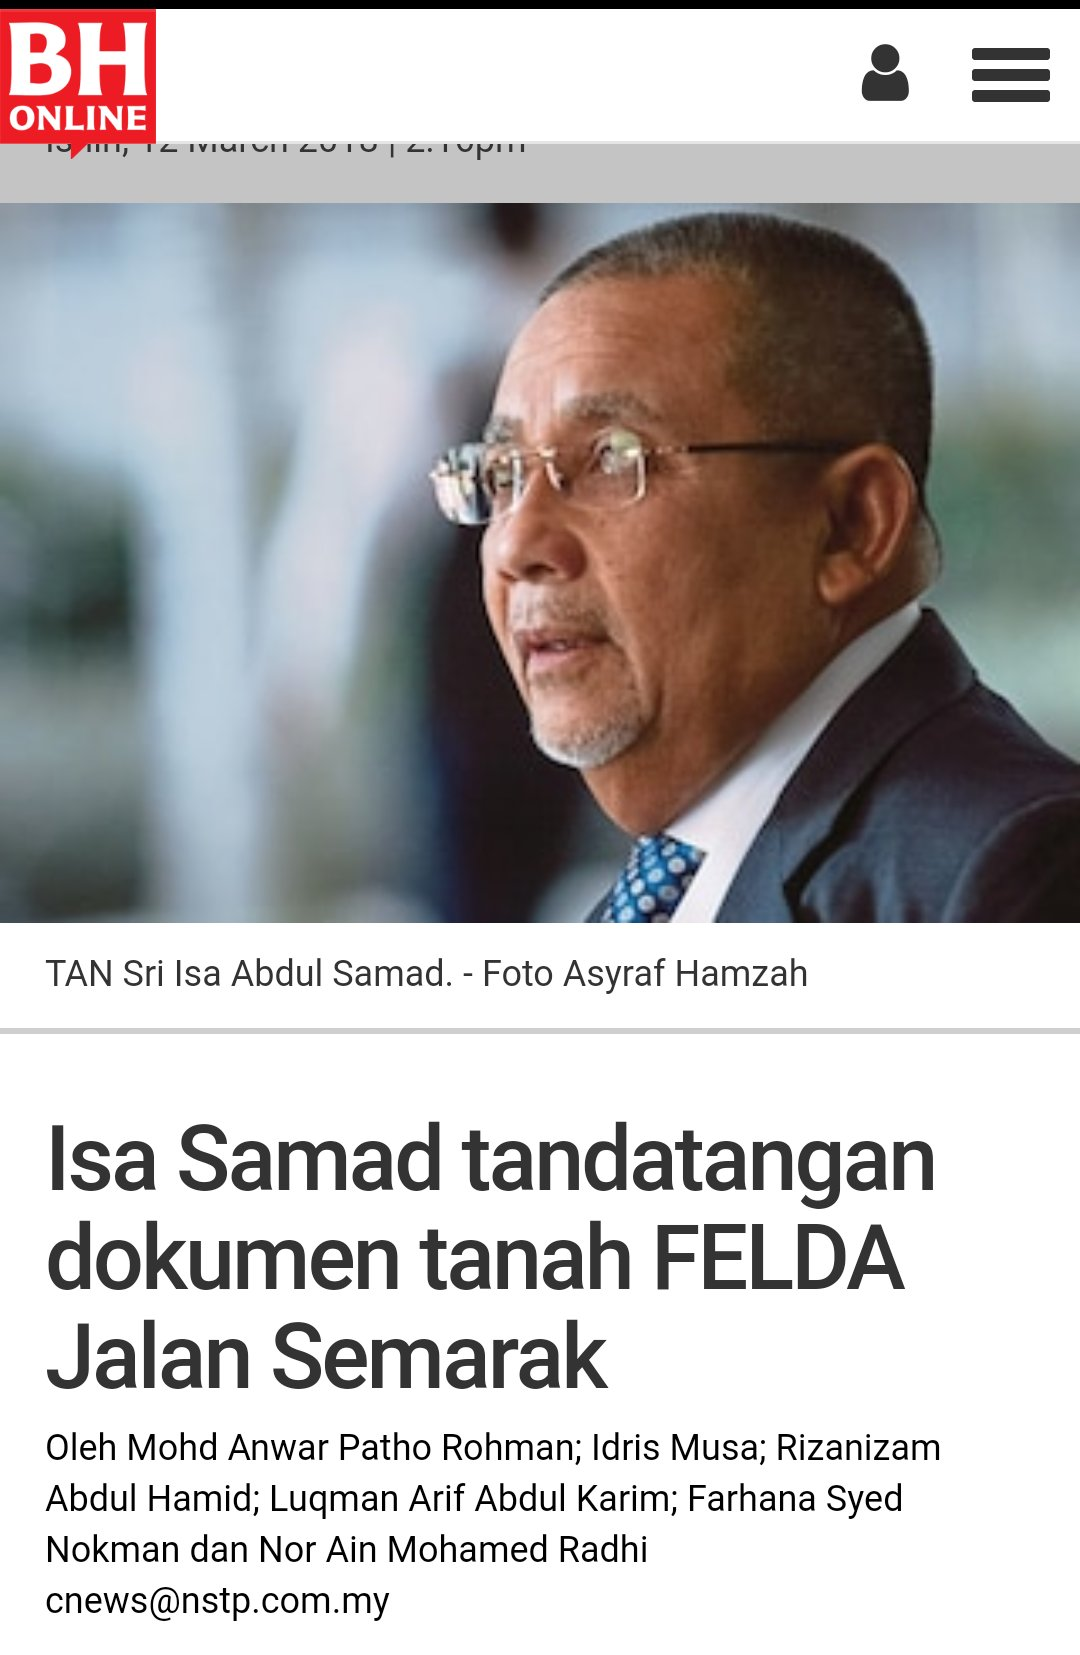 Inilah calon Umno. Syabas! https://t.co/oTwMUSa2wA